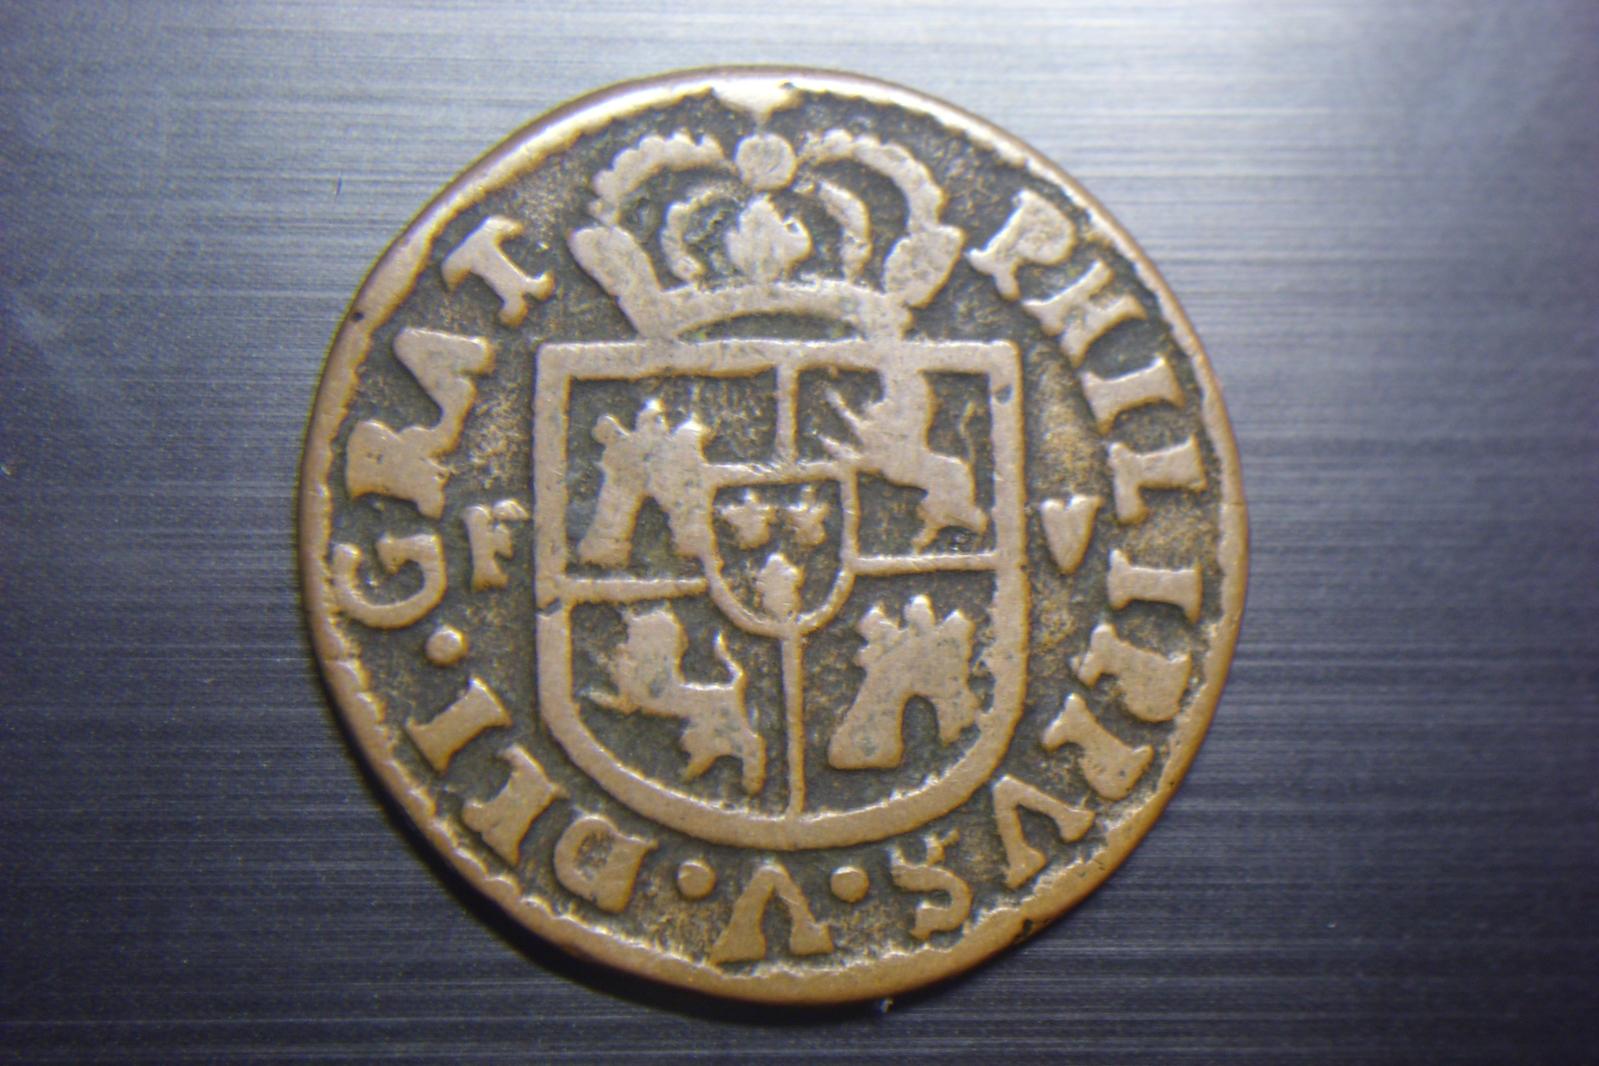 Seiseno de 1711, Felipe V. Valencia 2q3ccrb